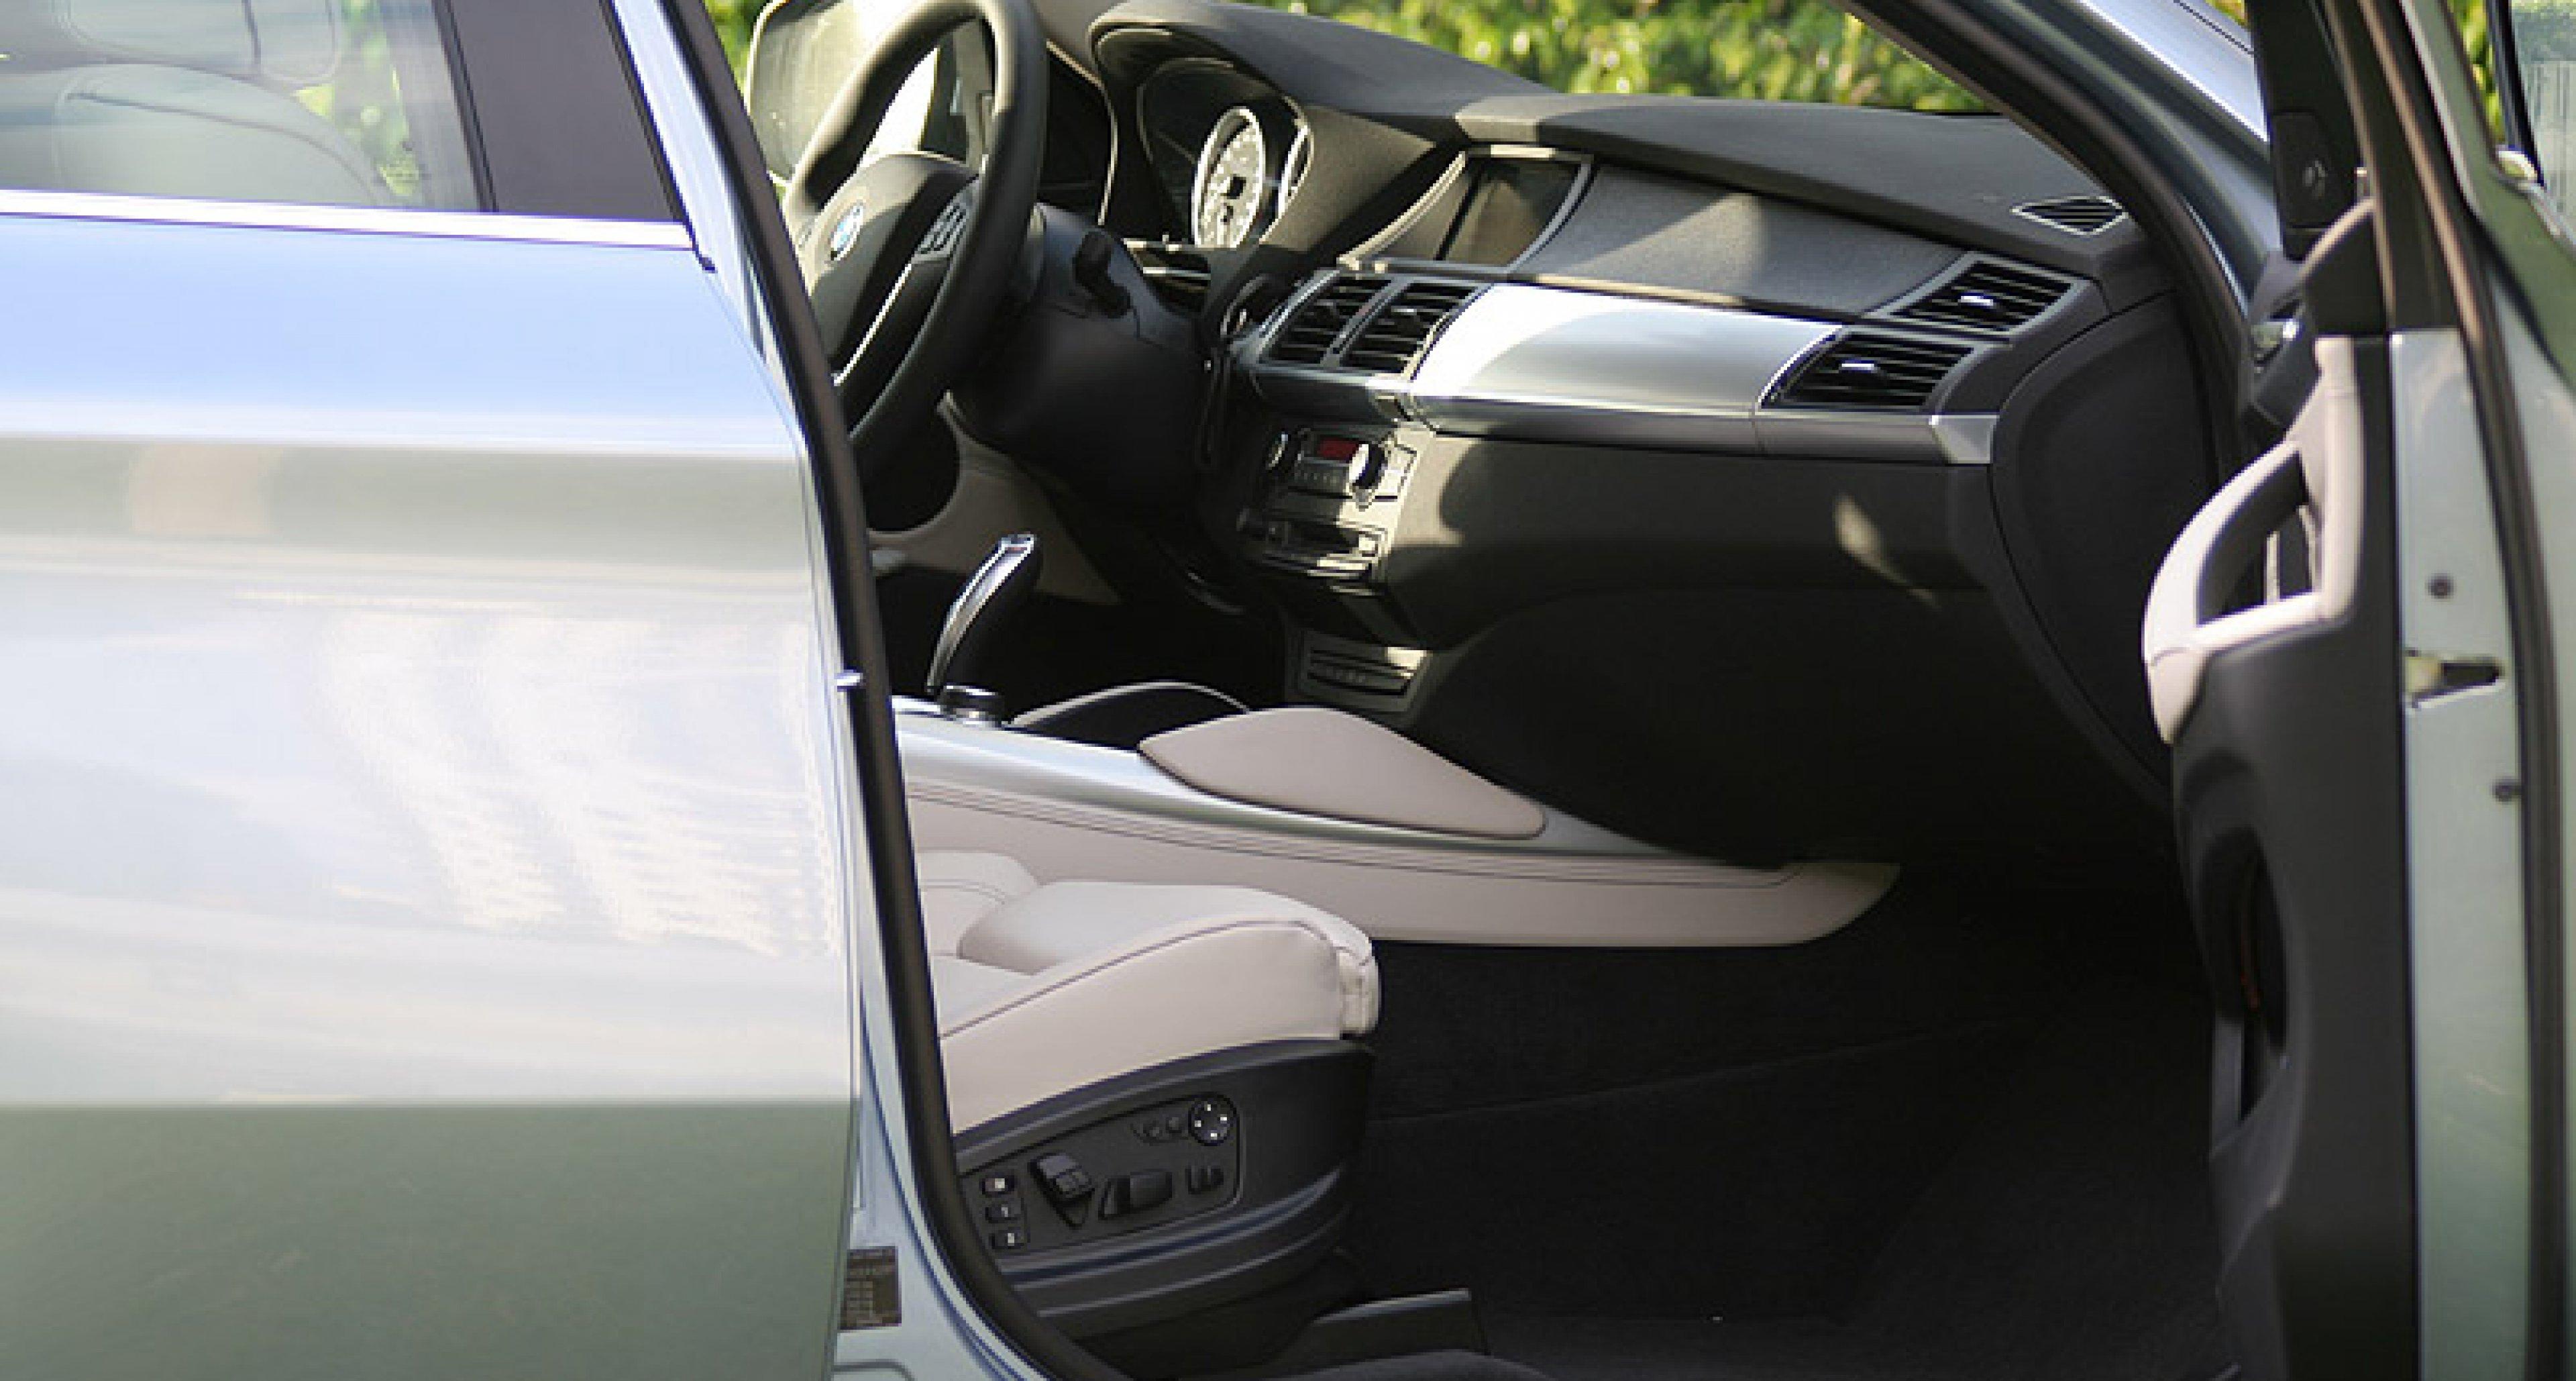 BMW X6 ActiveHybrid: Aller Anfang ist schwer